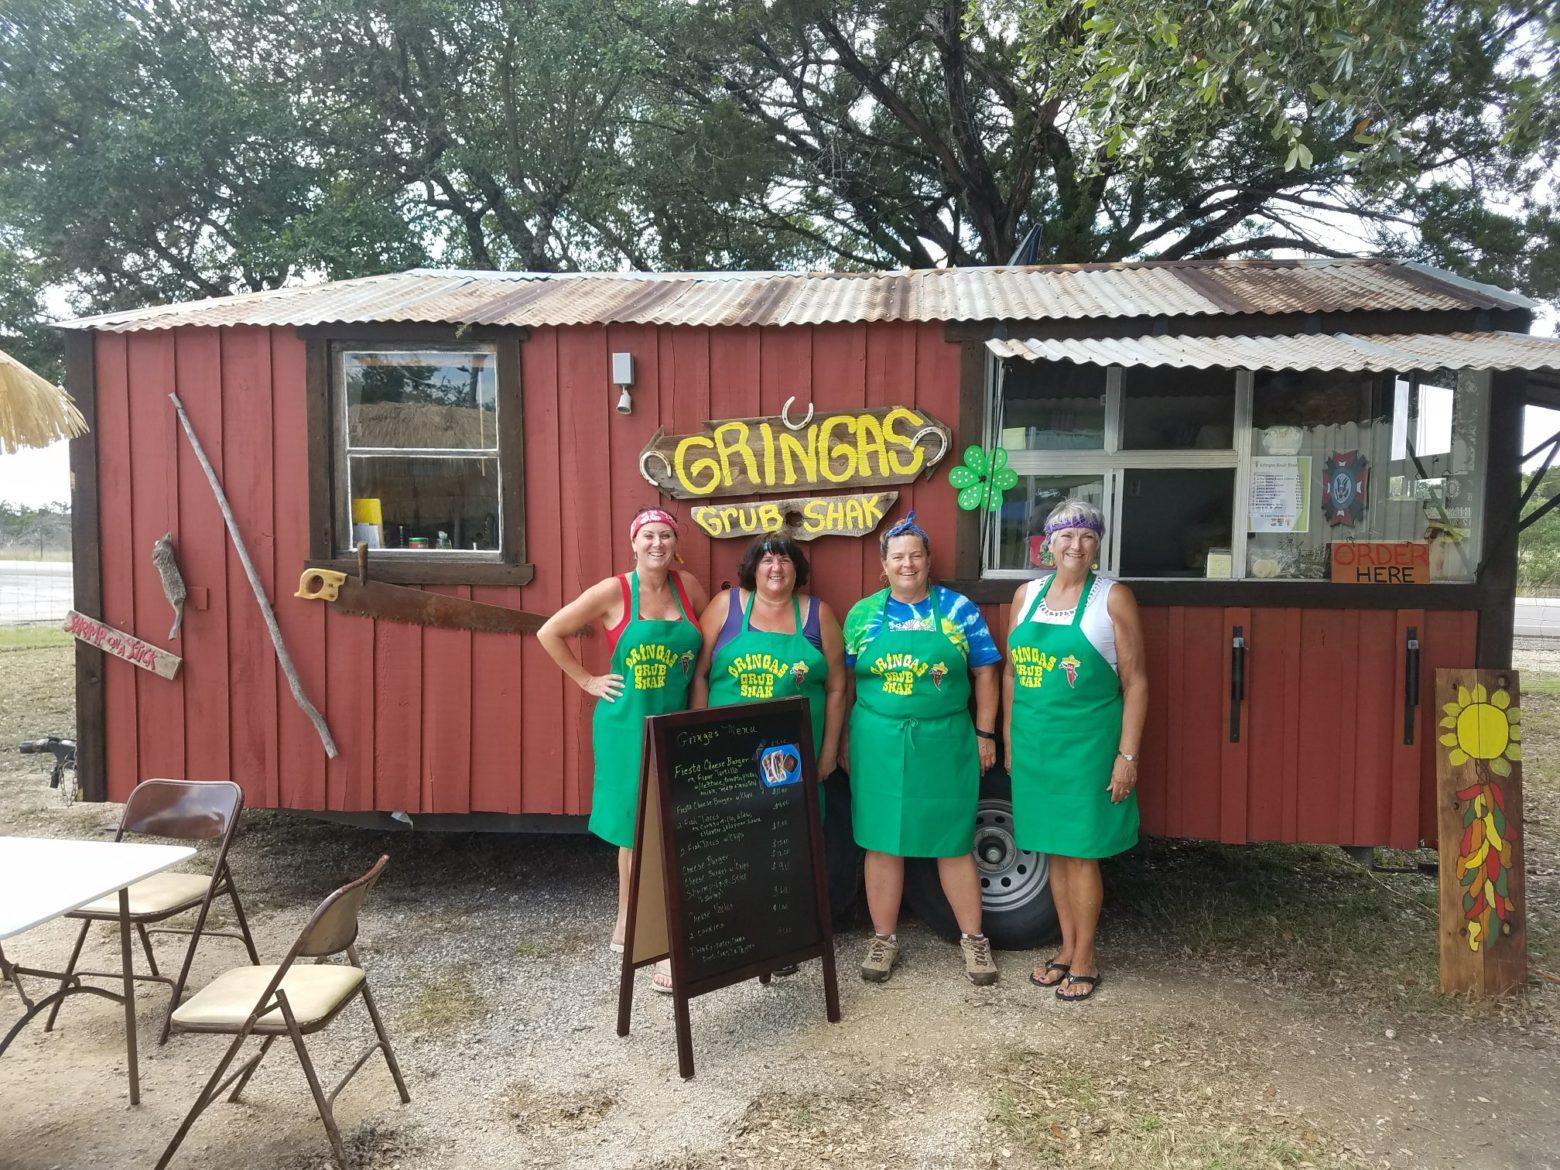 Taco Tuesday, tacos near Dripping Springs, Gringas Grub Shak